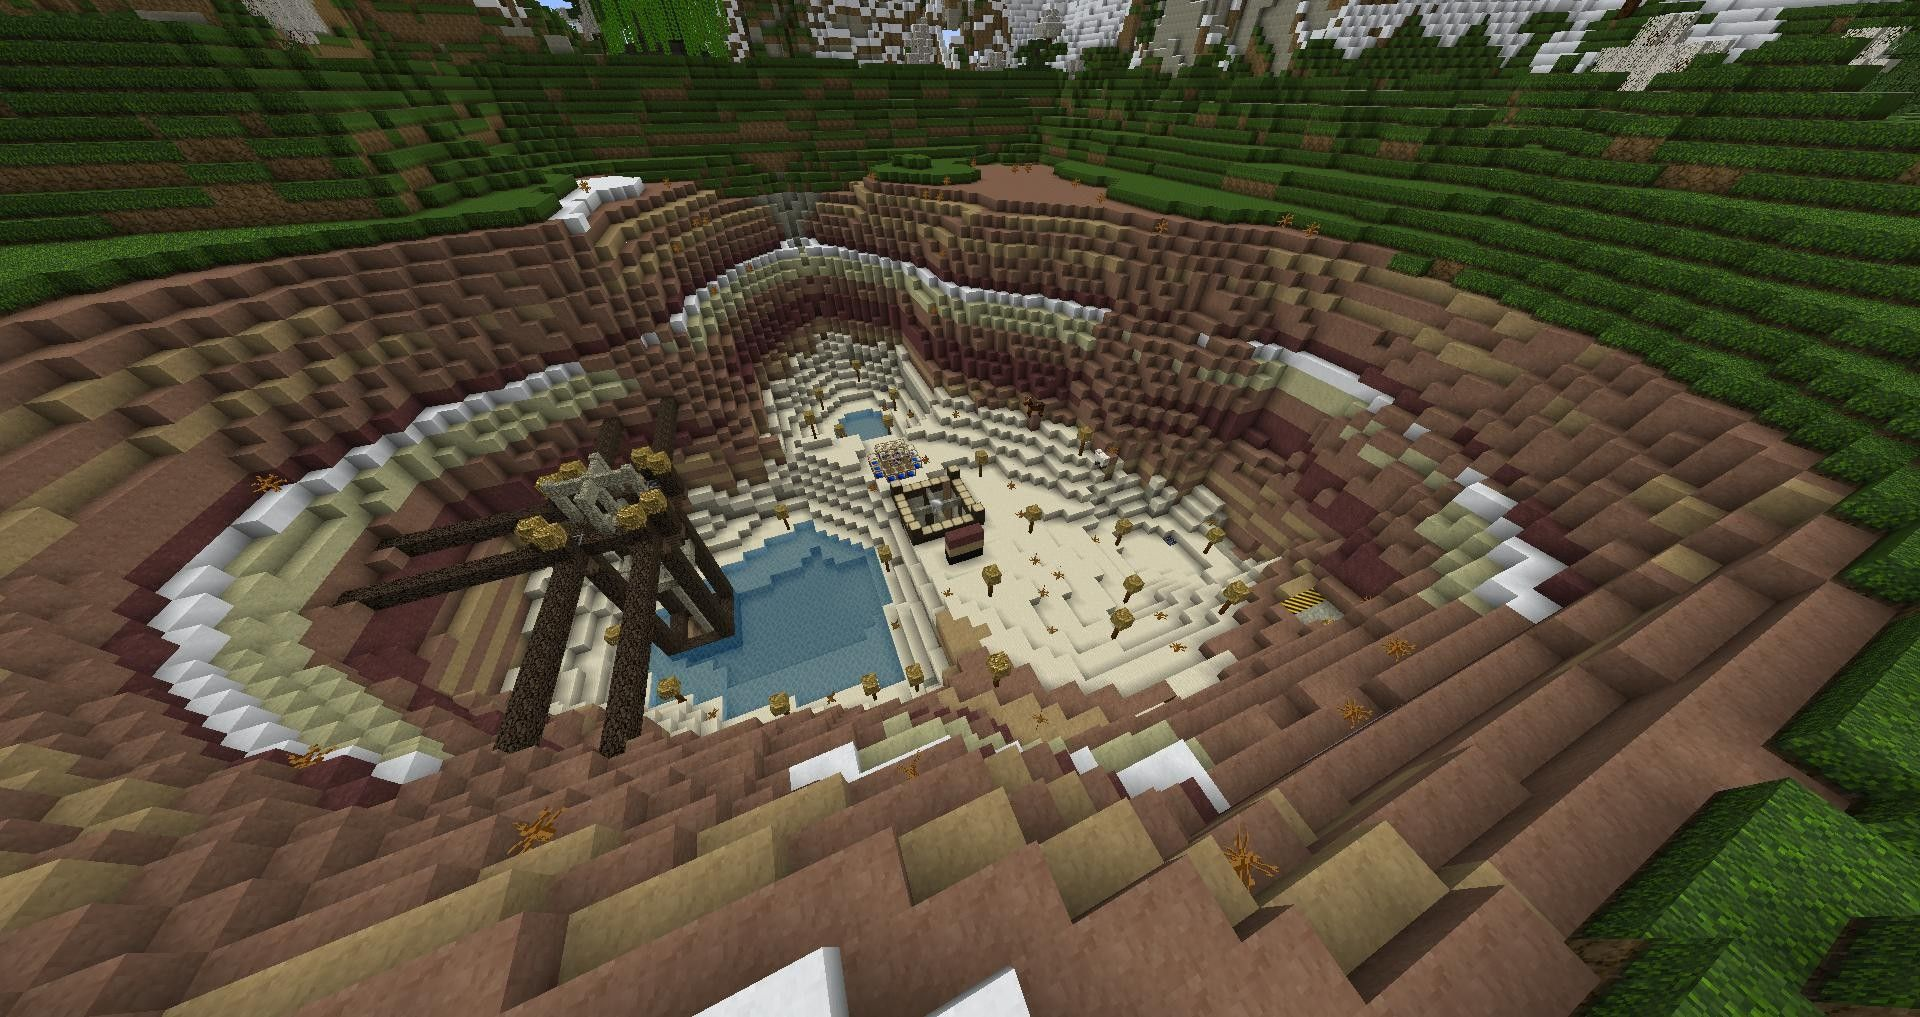 Minecraft Quarry | Minecraft designs, Minecraft, Minecraft houses